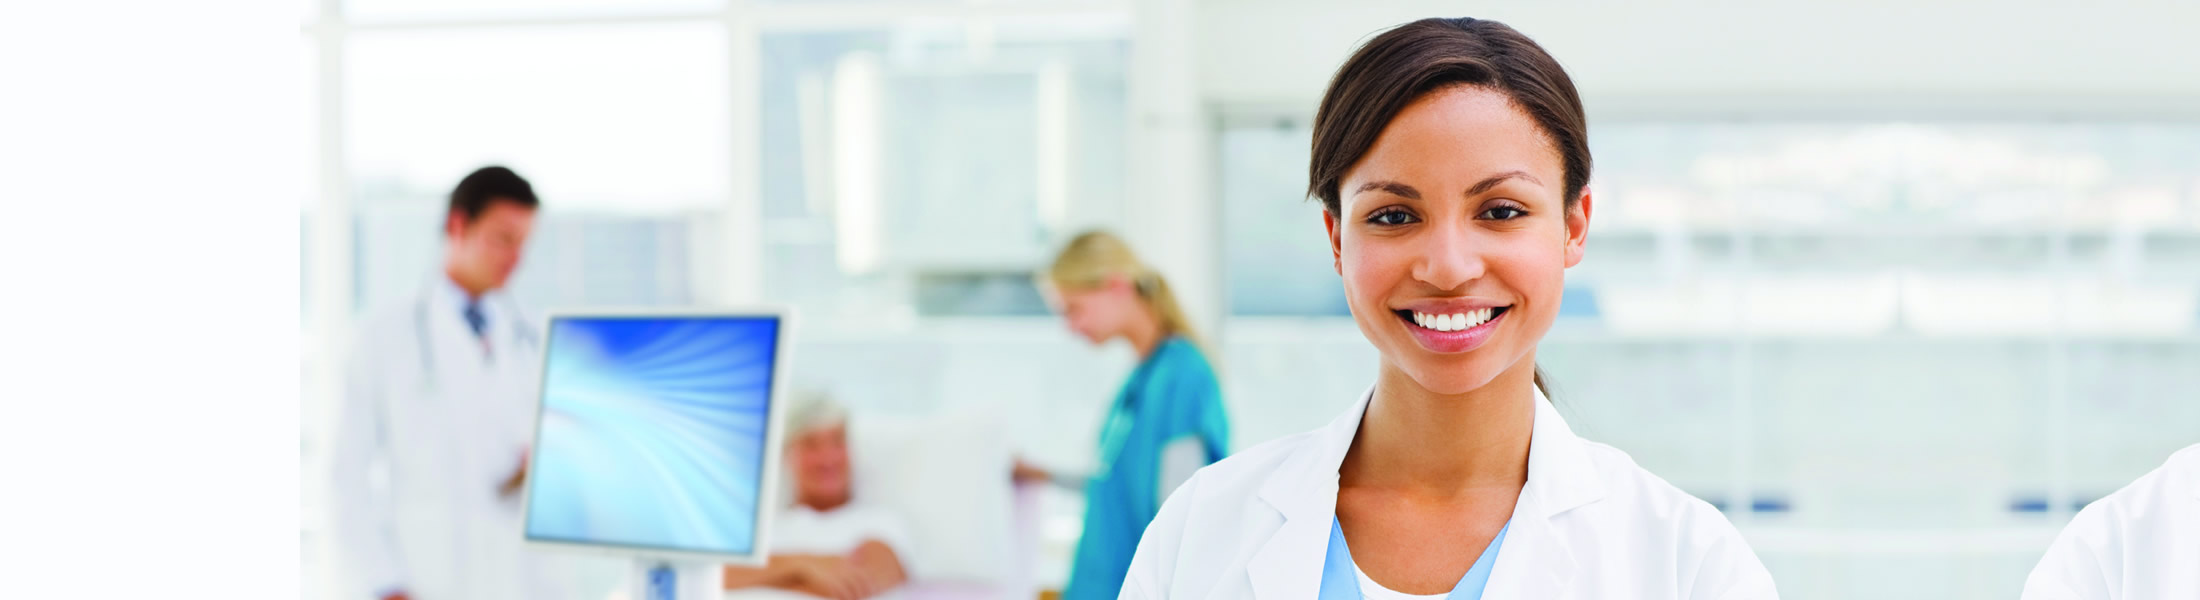 Neuroendocrine cancer best doctors. High risk hpv cancer risk